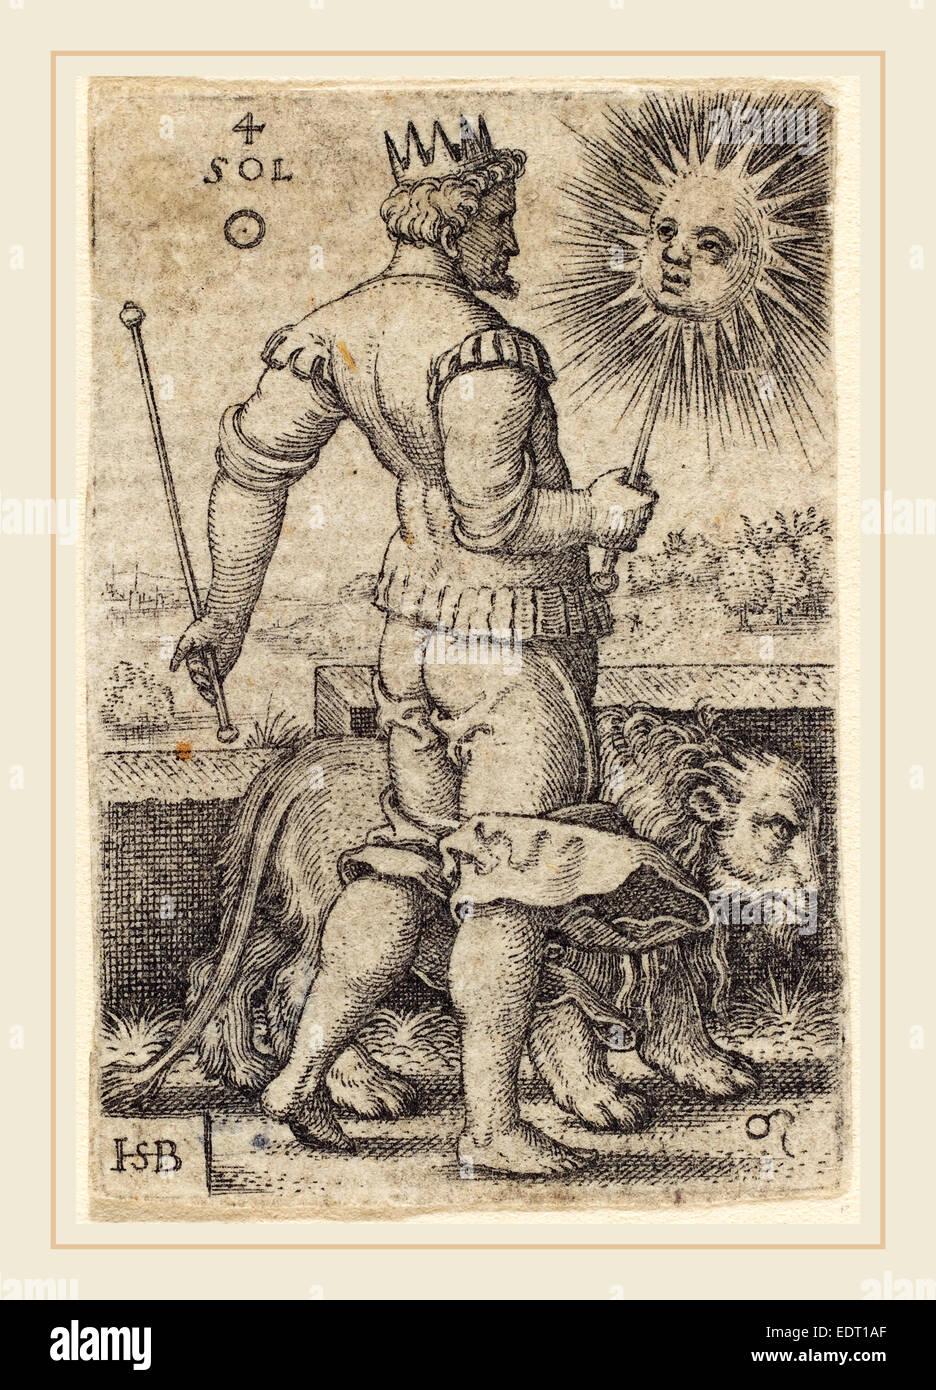 Sebald Beham (German, 1500-1550), Sol, engraving - Stock Image